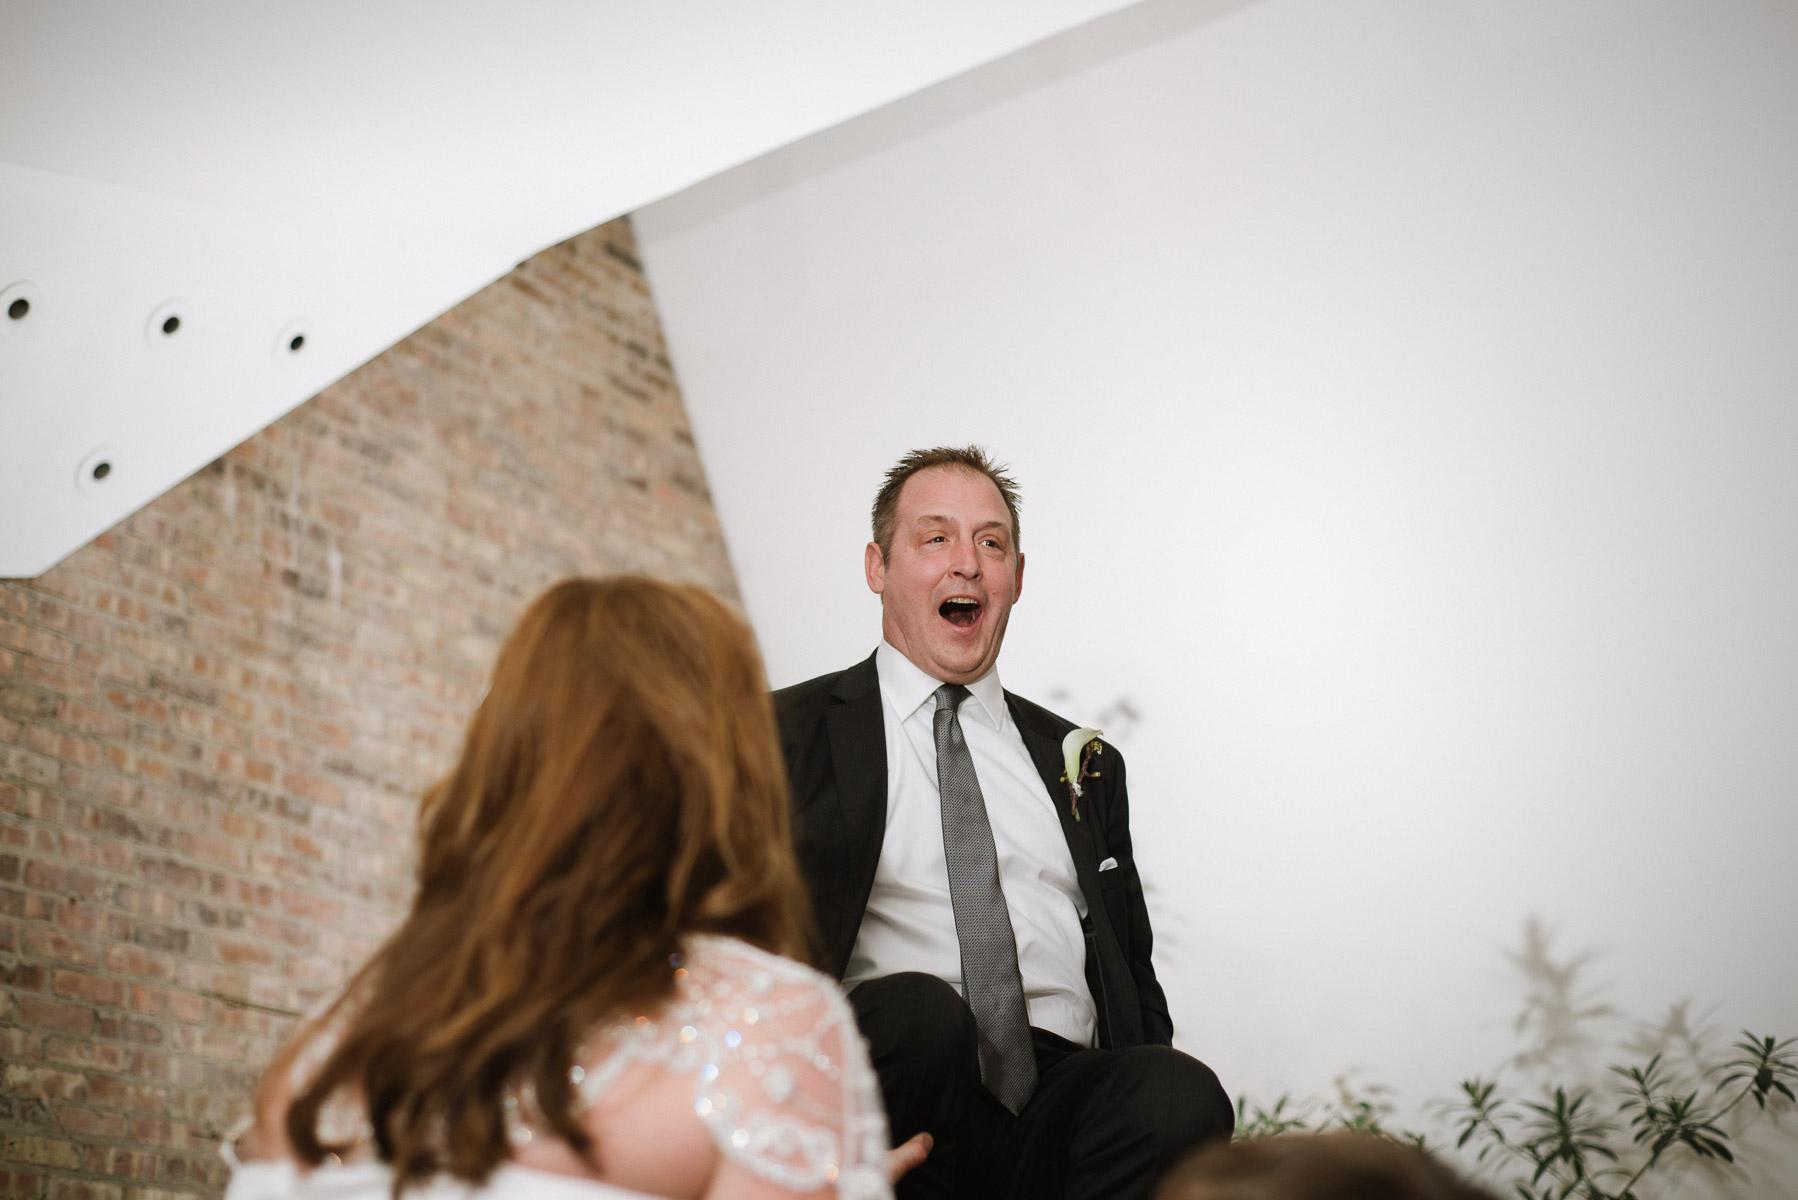 Pamela Yasuko Photography - A New Leaf Wedding - Chicago Oahu Photographer-53.jpg